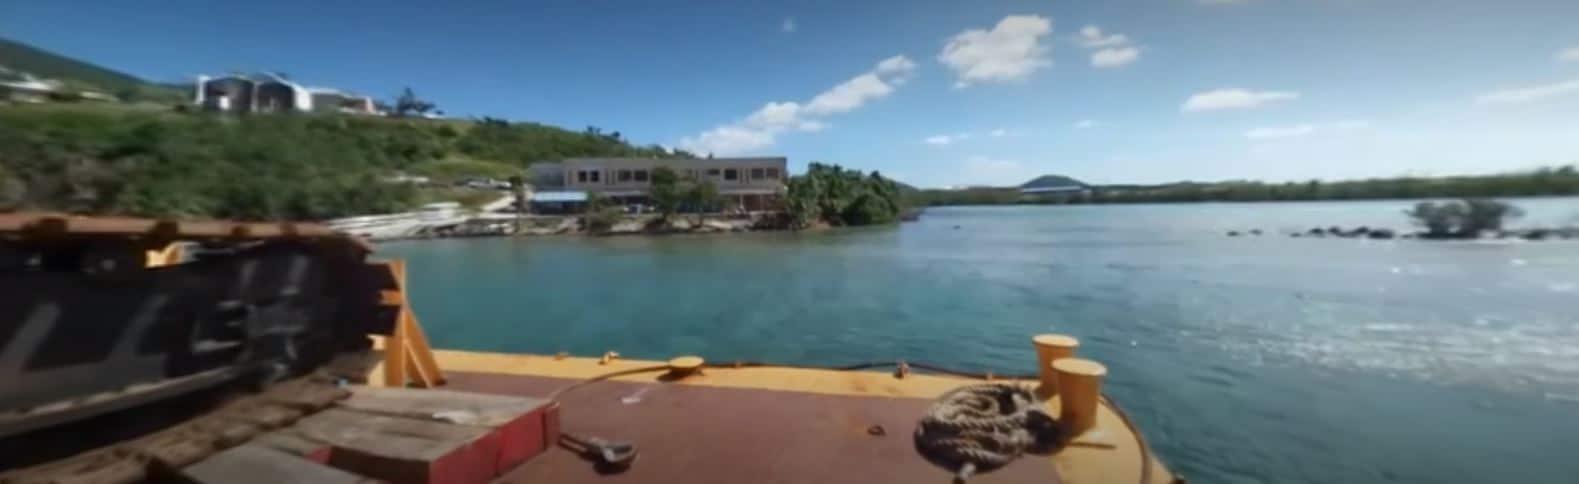 VERTEX Assists USEPA and US Coast Guard in Virgin Islands